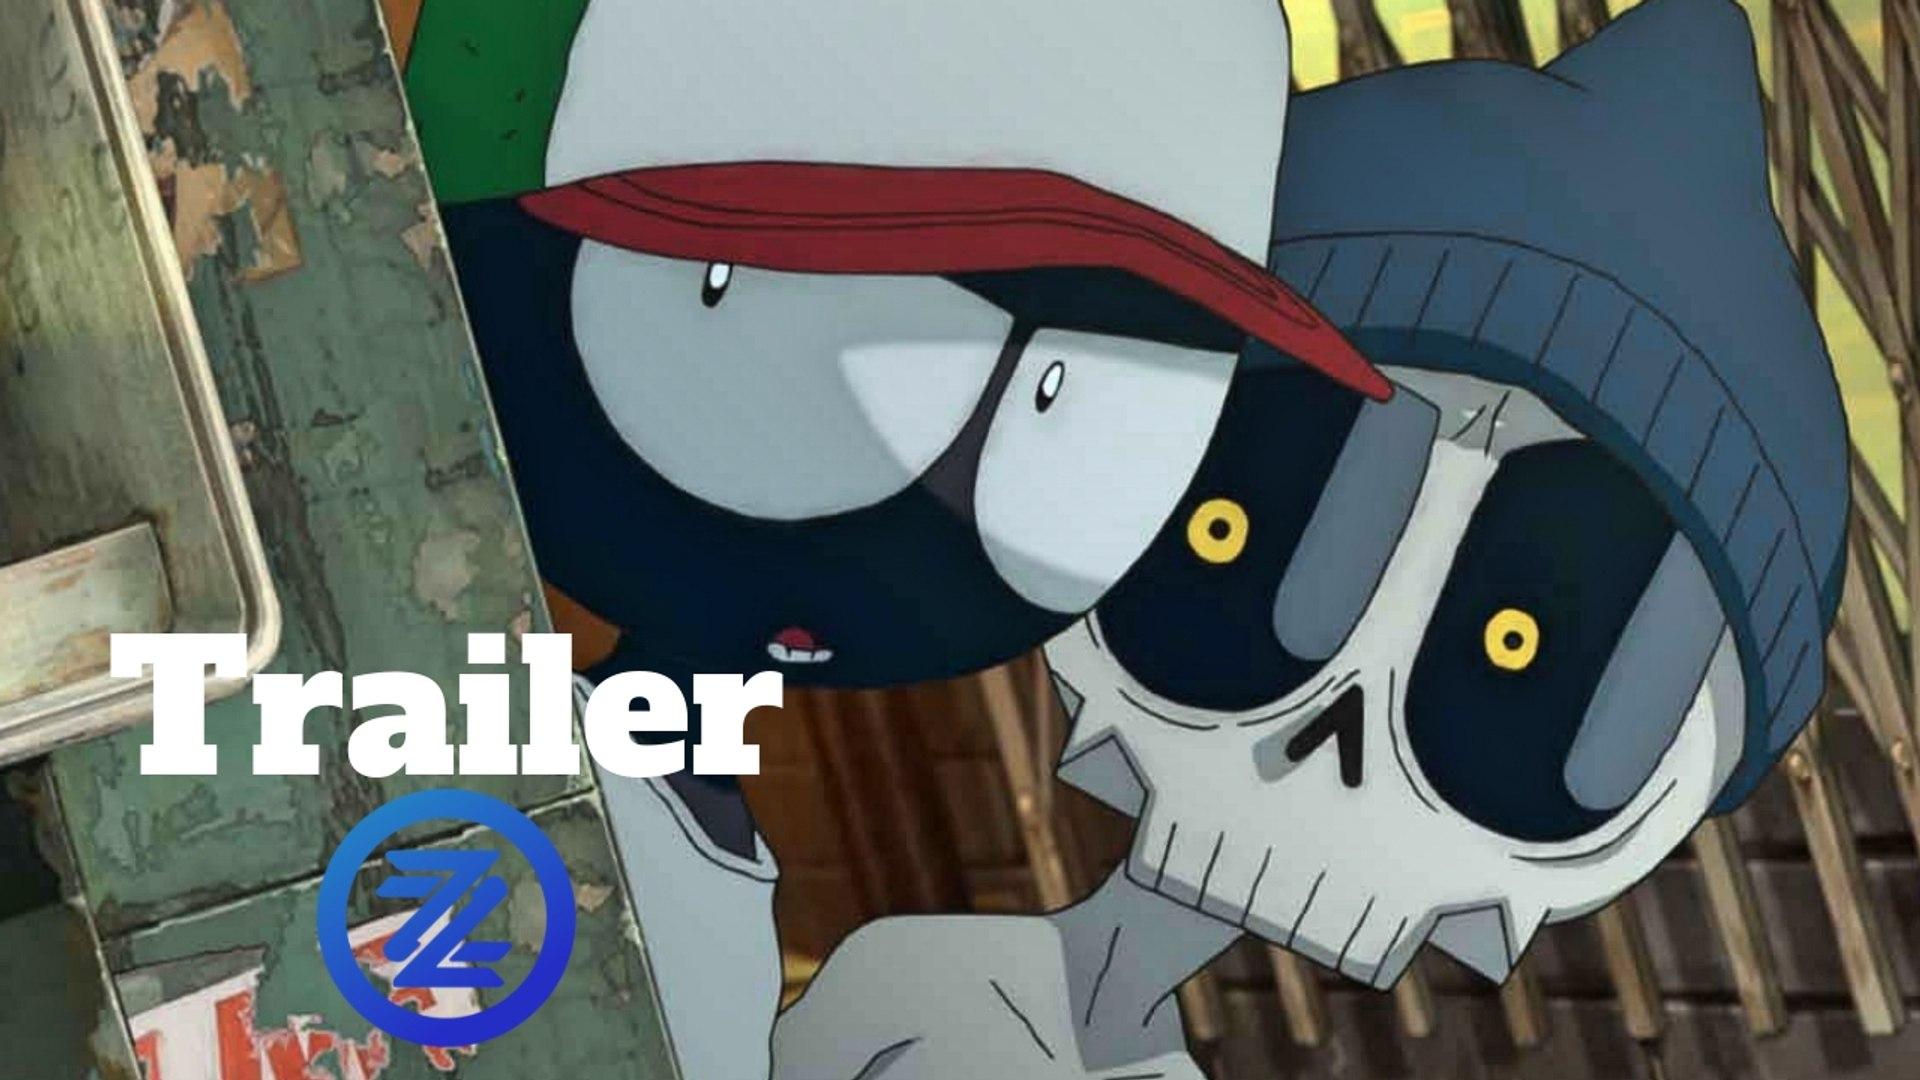 Mfkz Teaser Trailer 1 2018 Tay Lee Mark Ryan Haltom Animated Movie Hd Video Dailymotion